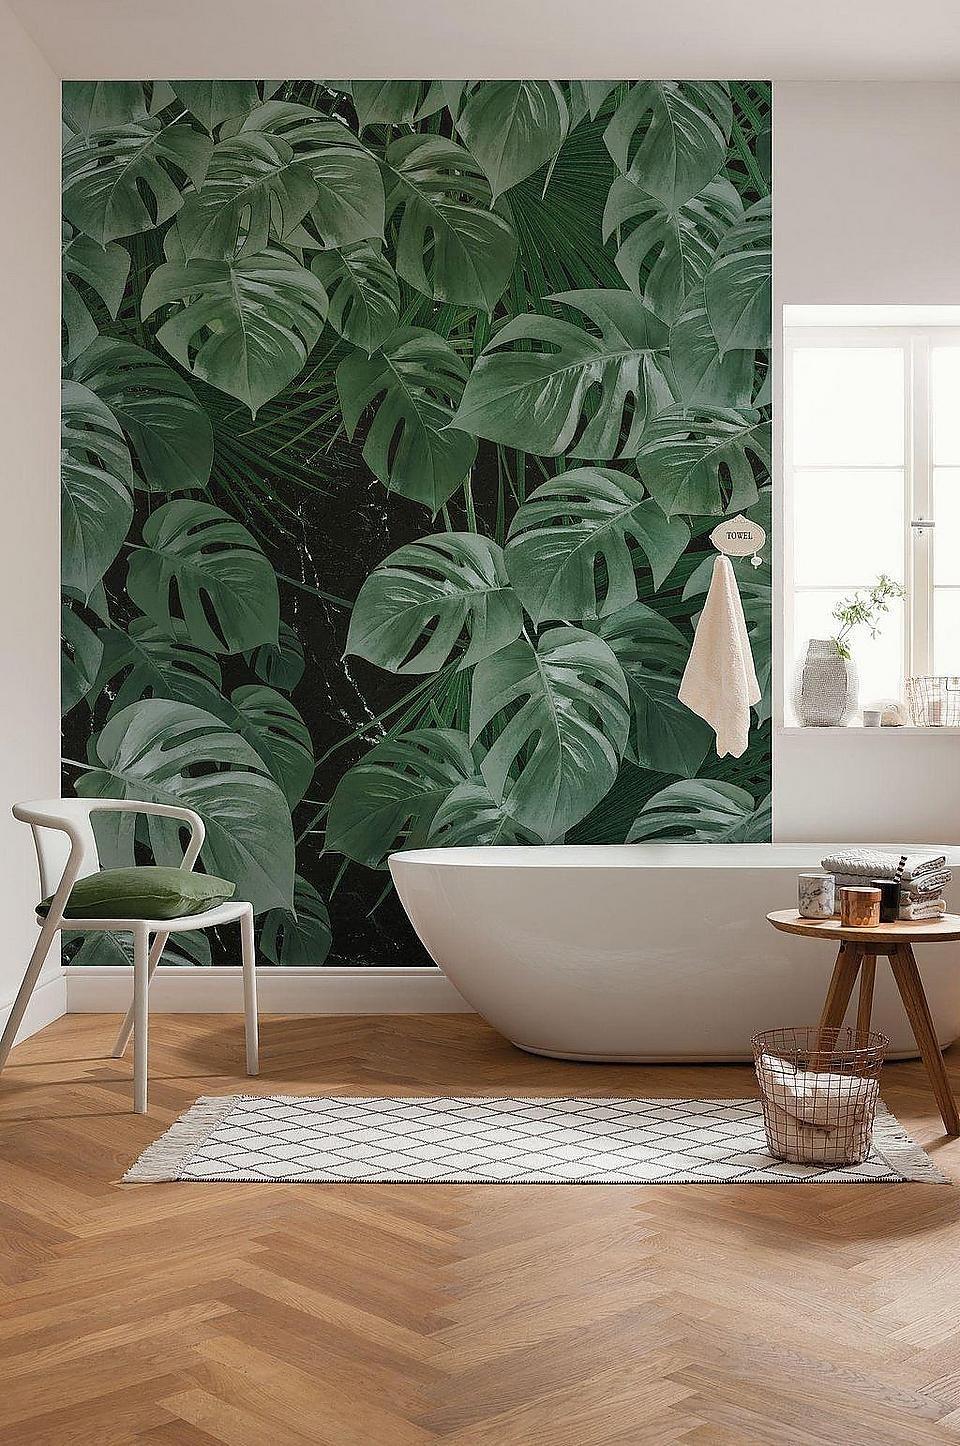 Komar Vlies Fototapete Monstera On Marble Badezimmer Bad Einrichten Einrichtungsideen Tapeten Wandbilder Komar Tapeten Tapeten